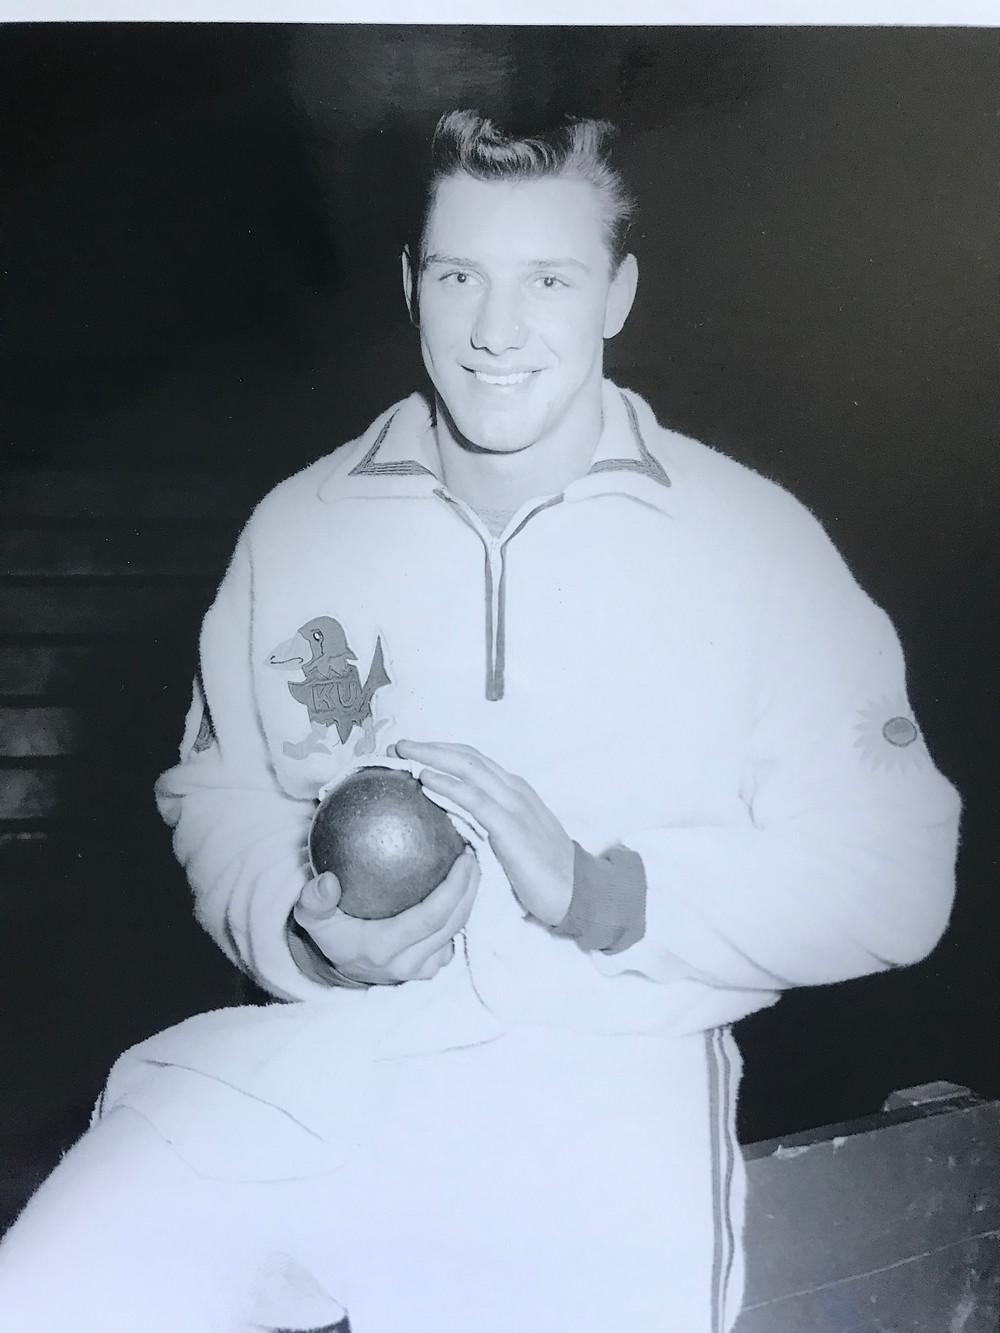 Al Oerter, Indoor Season at Kansas